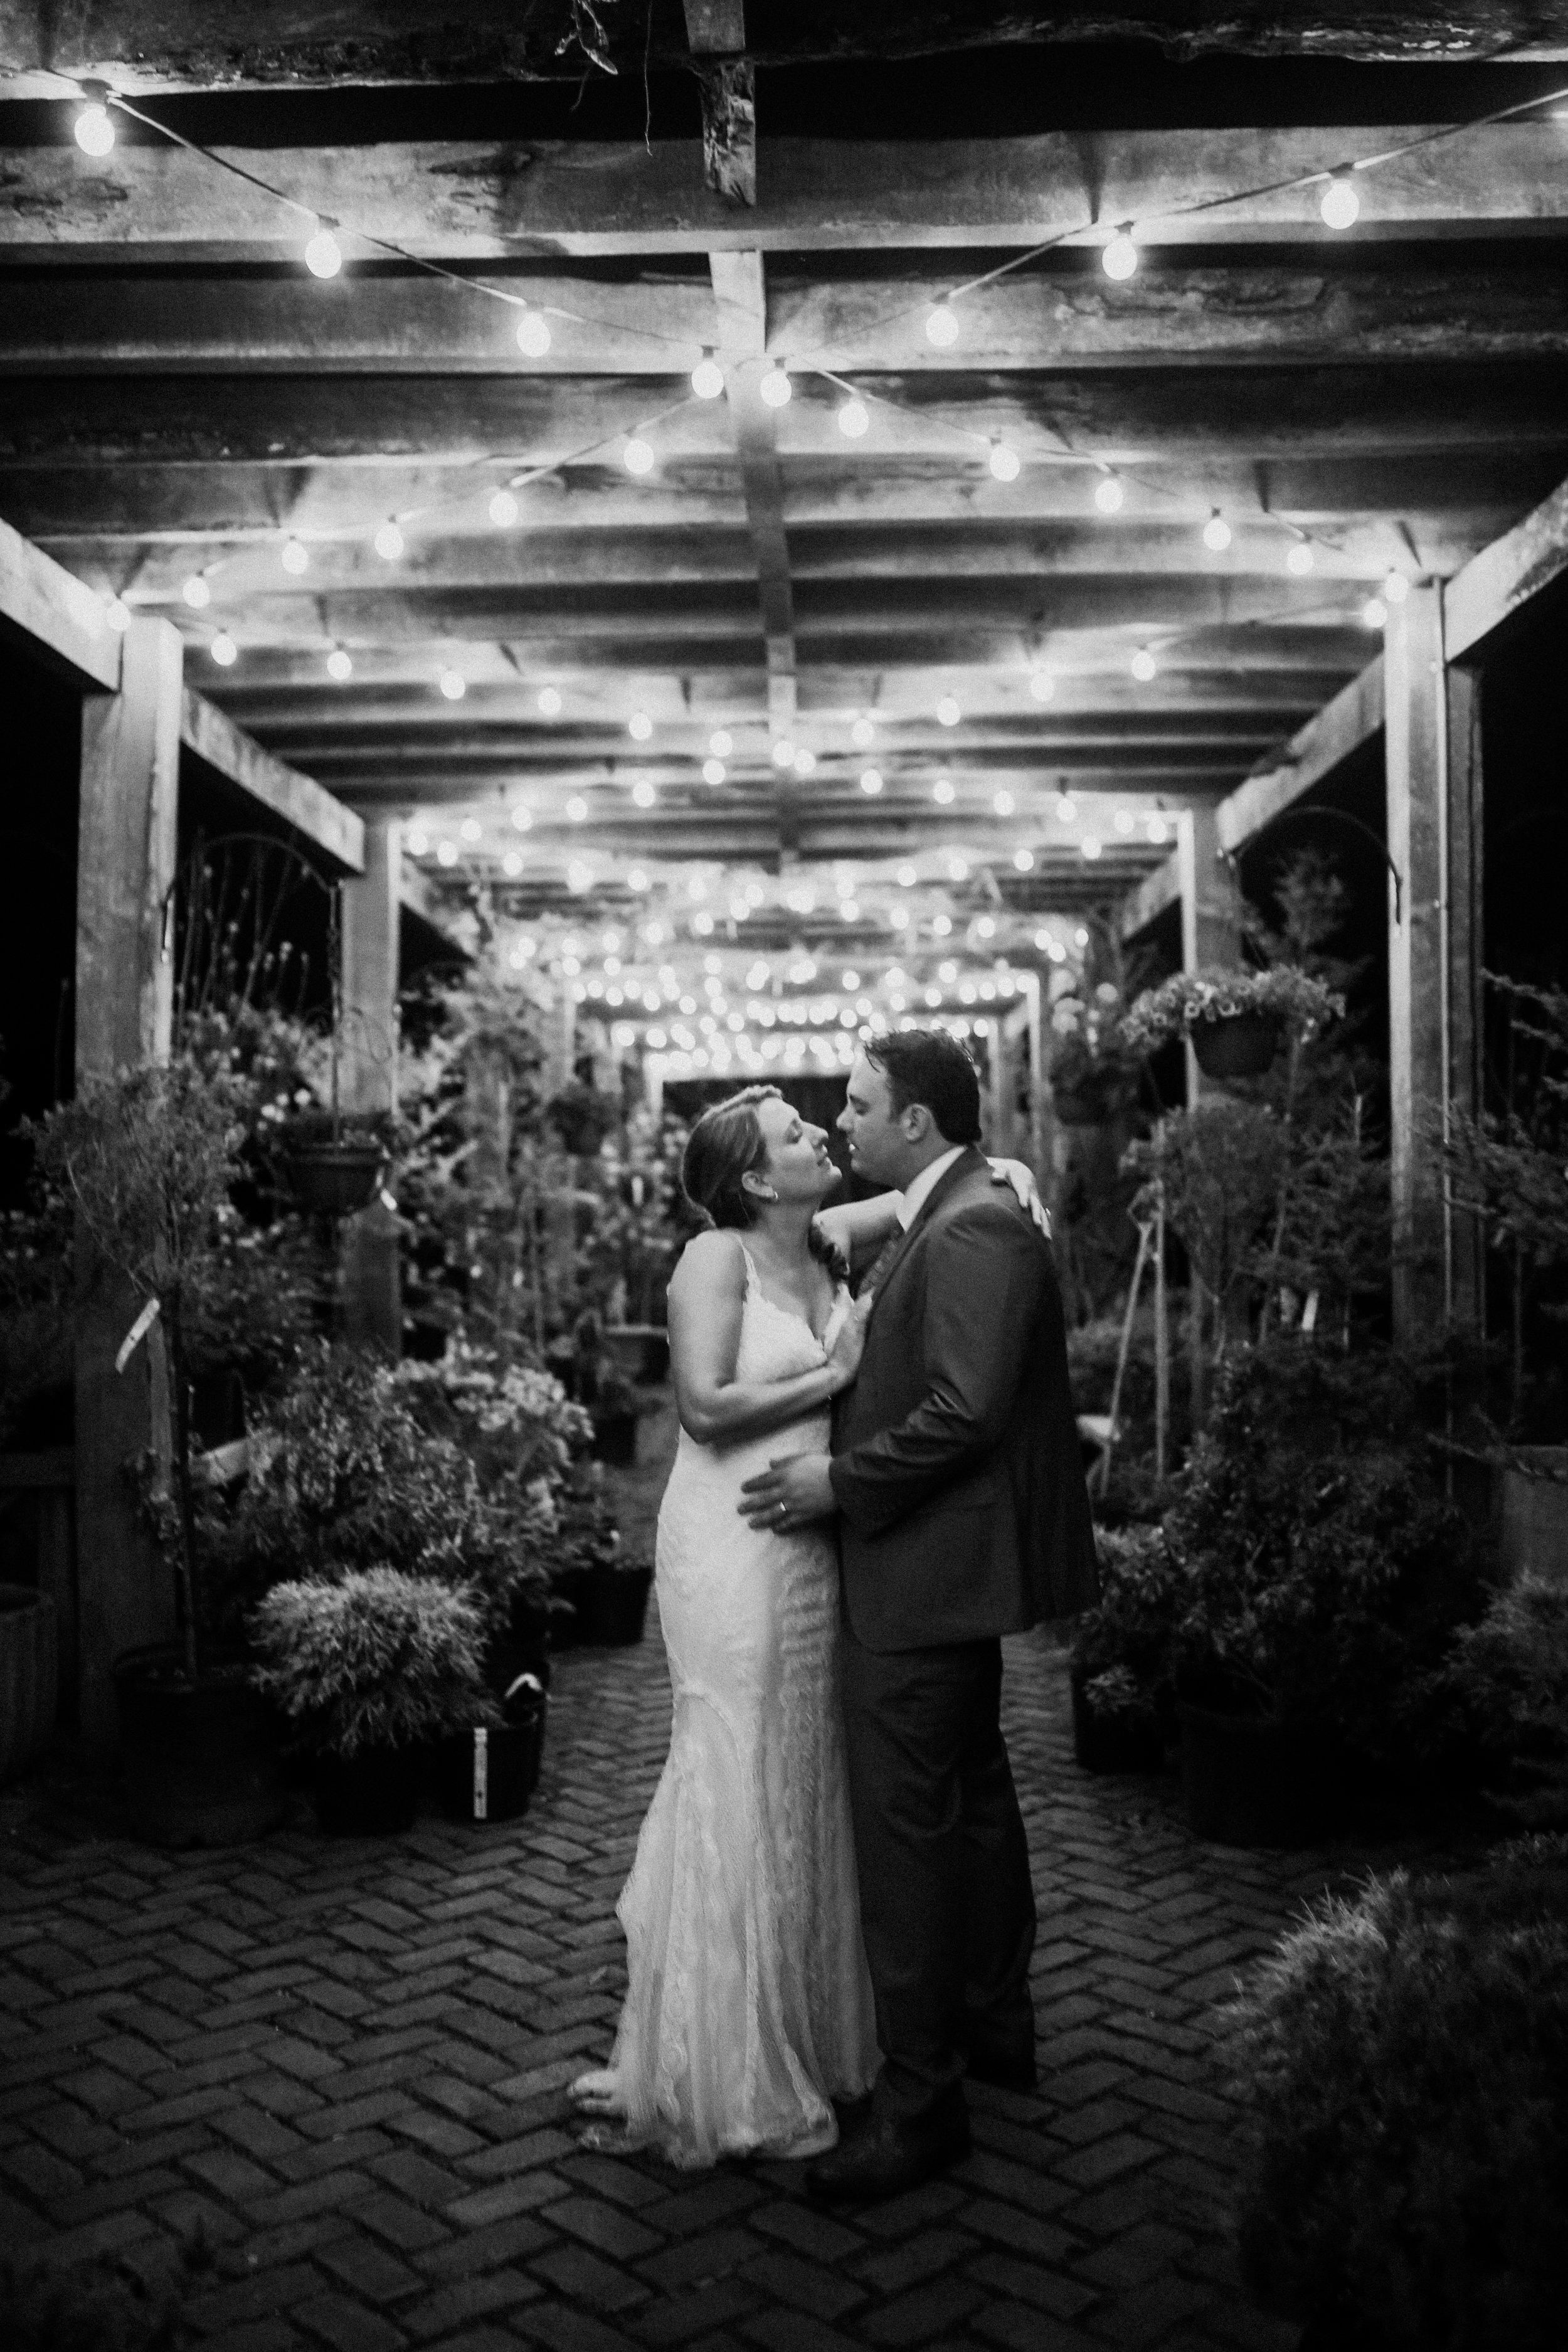 TheGreens_Married_2019-671.jpg